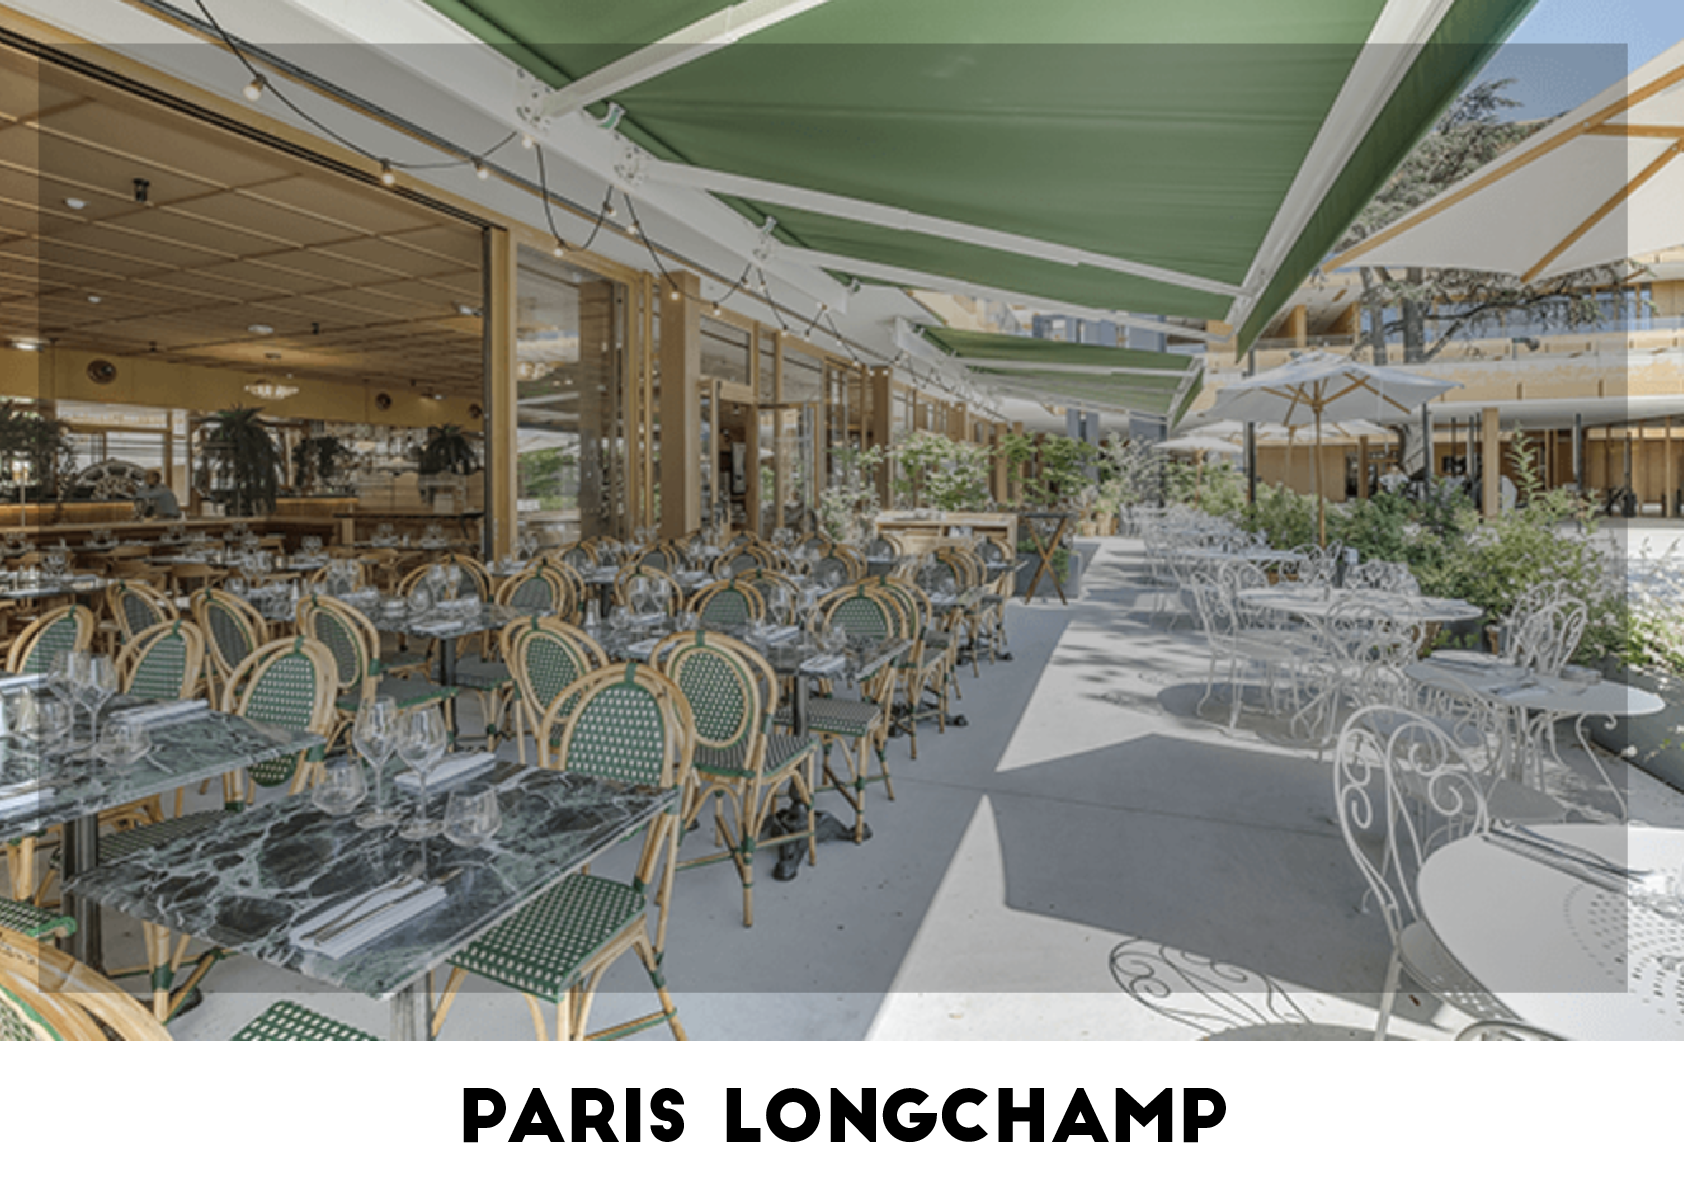 Paris Longchamp